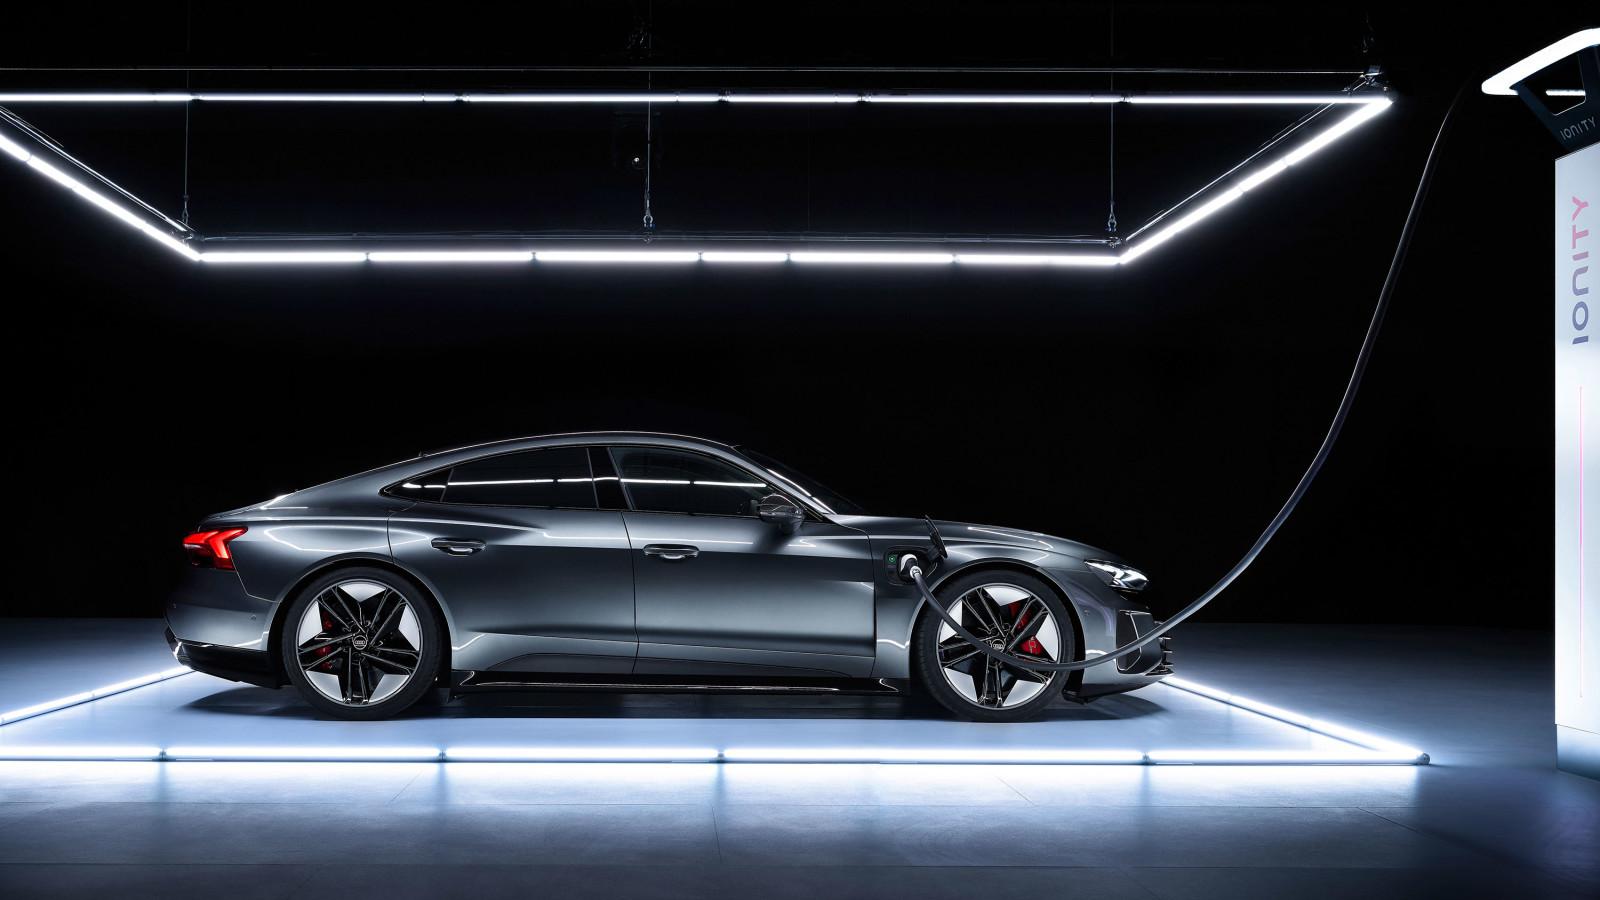 Der Audi e-tron GT ist endlich enthüllt.